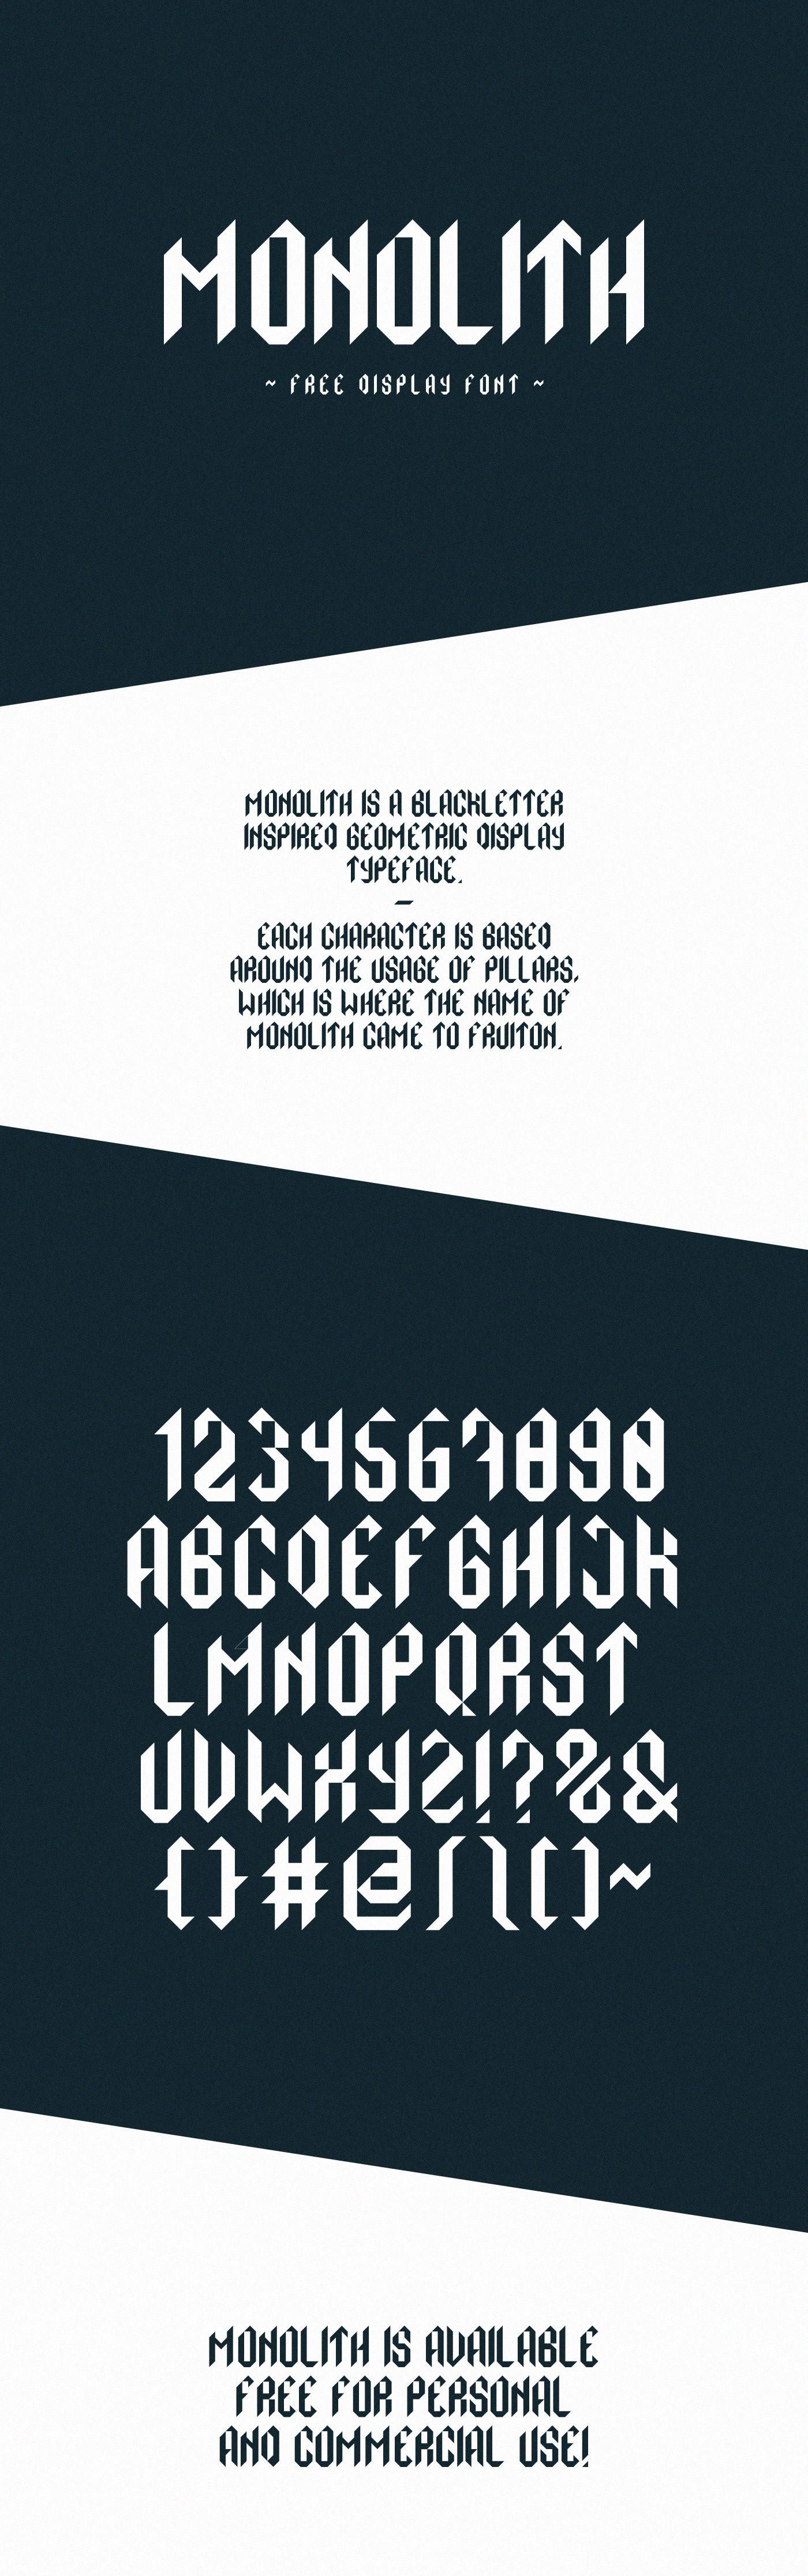 Monolith Typeface